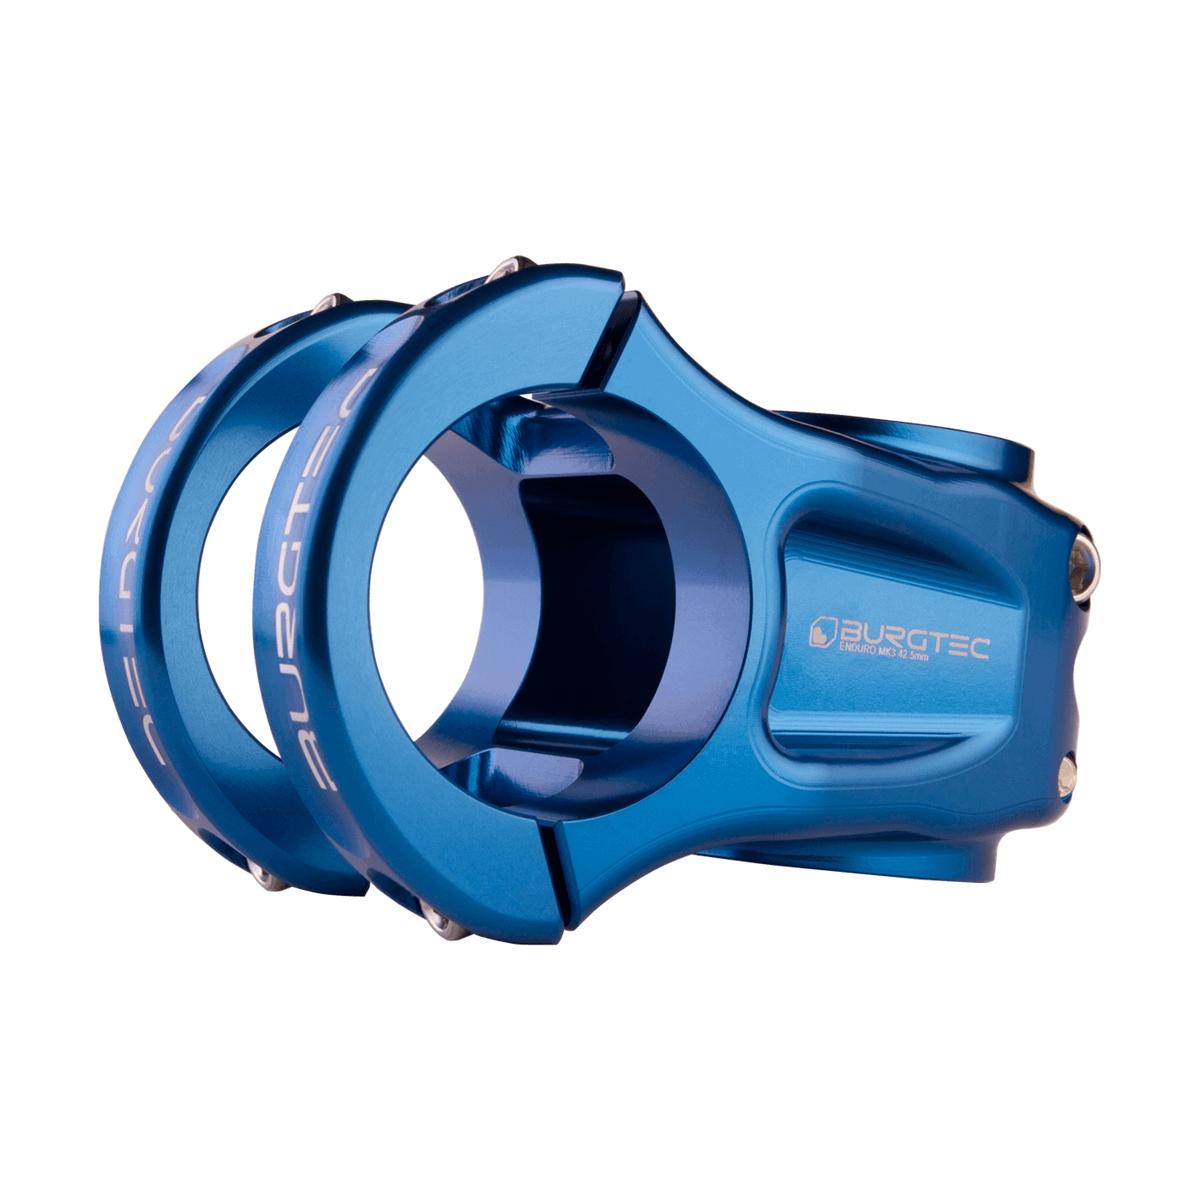 Handlebar stem 3433 Enduro MK3 42.5mm diameter 35mm Blue